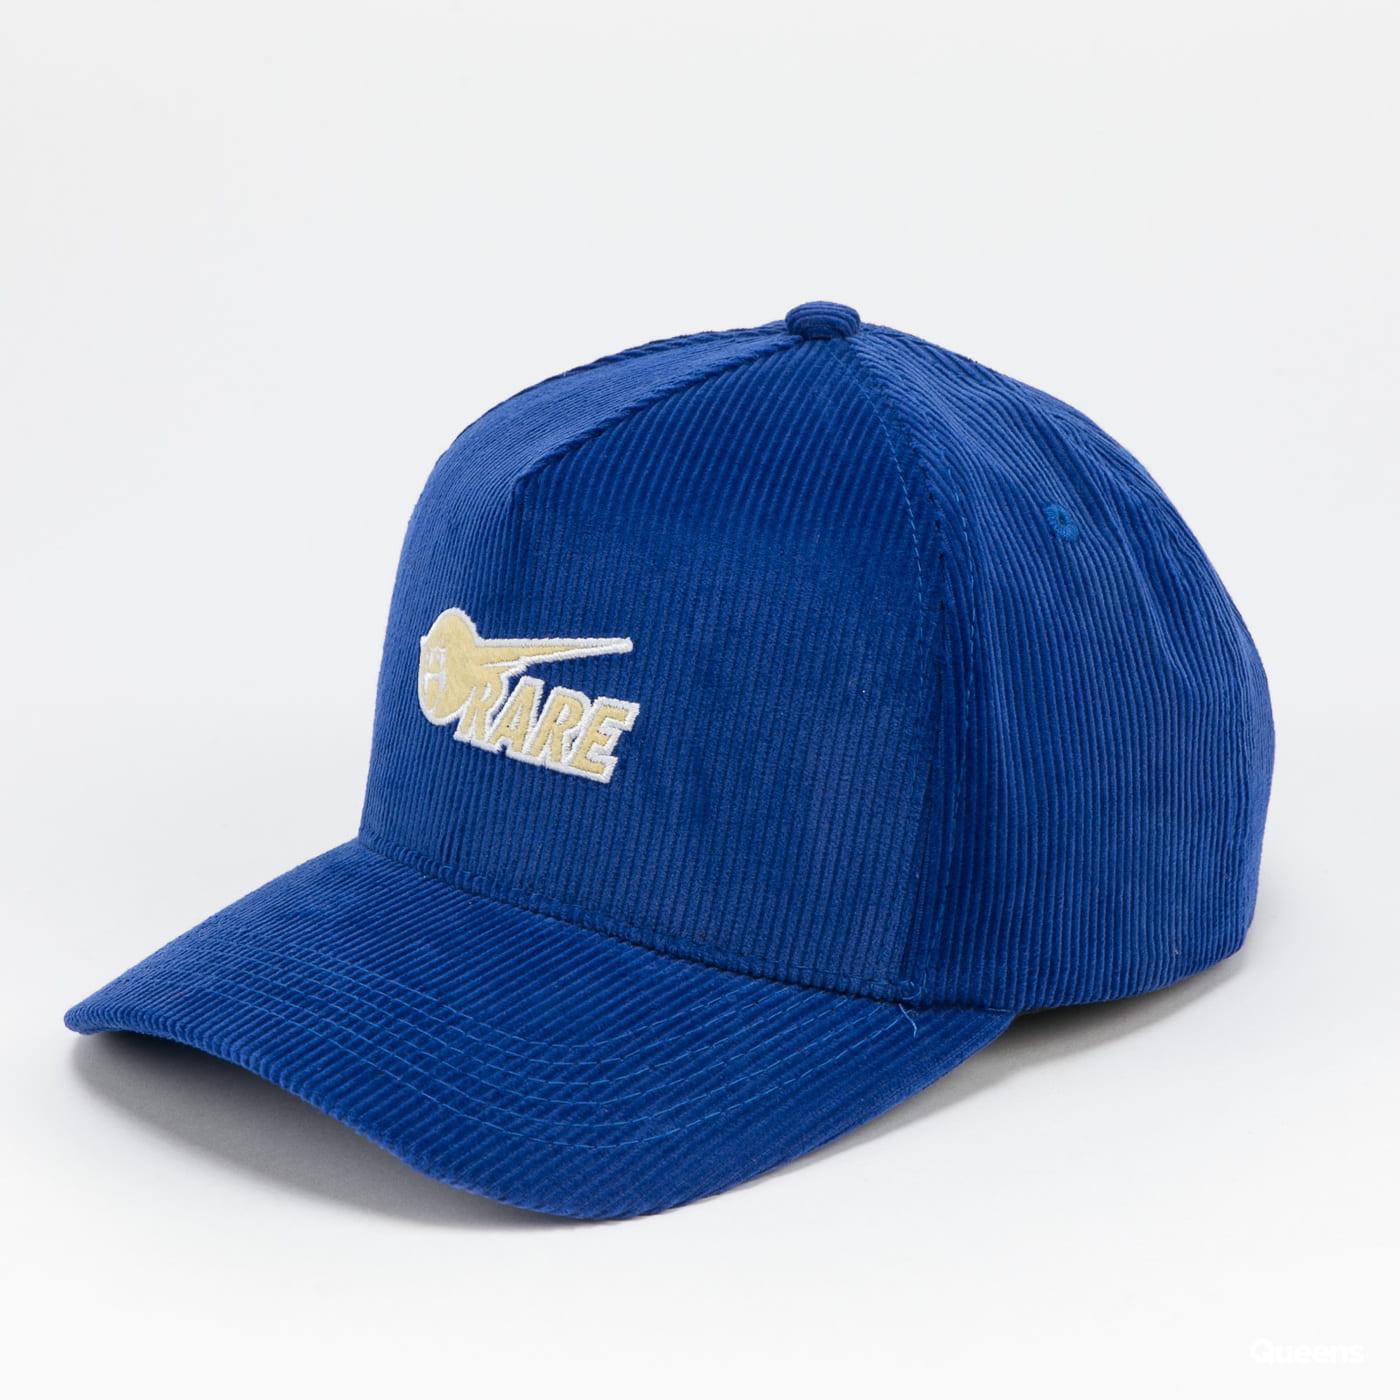 Pink Dolphin Rare Corduroy Zipback blue